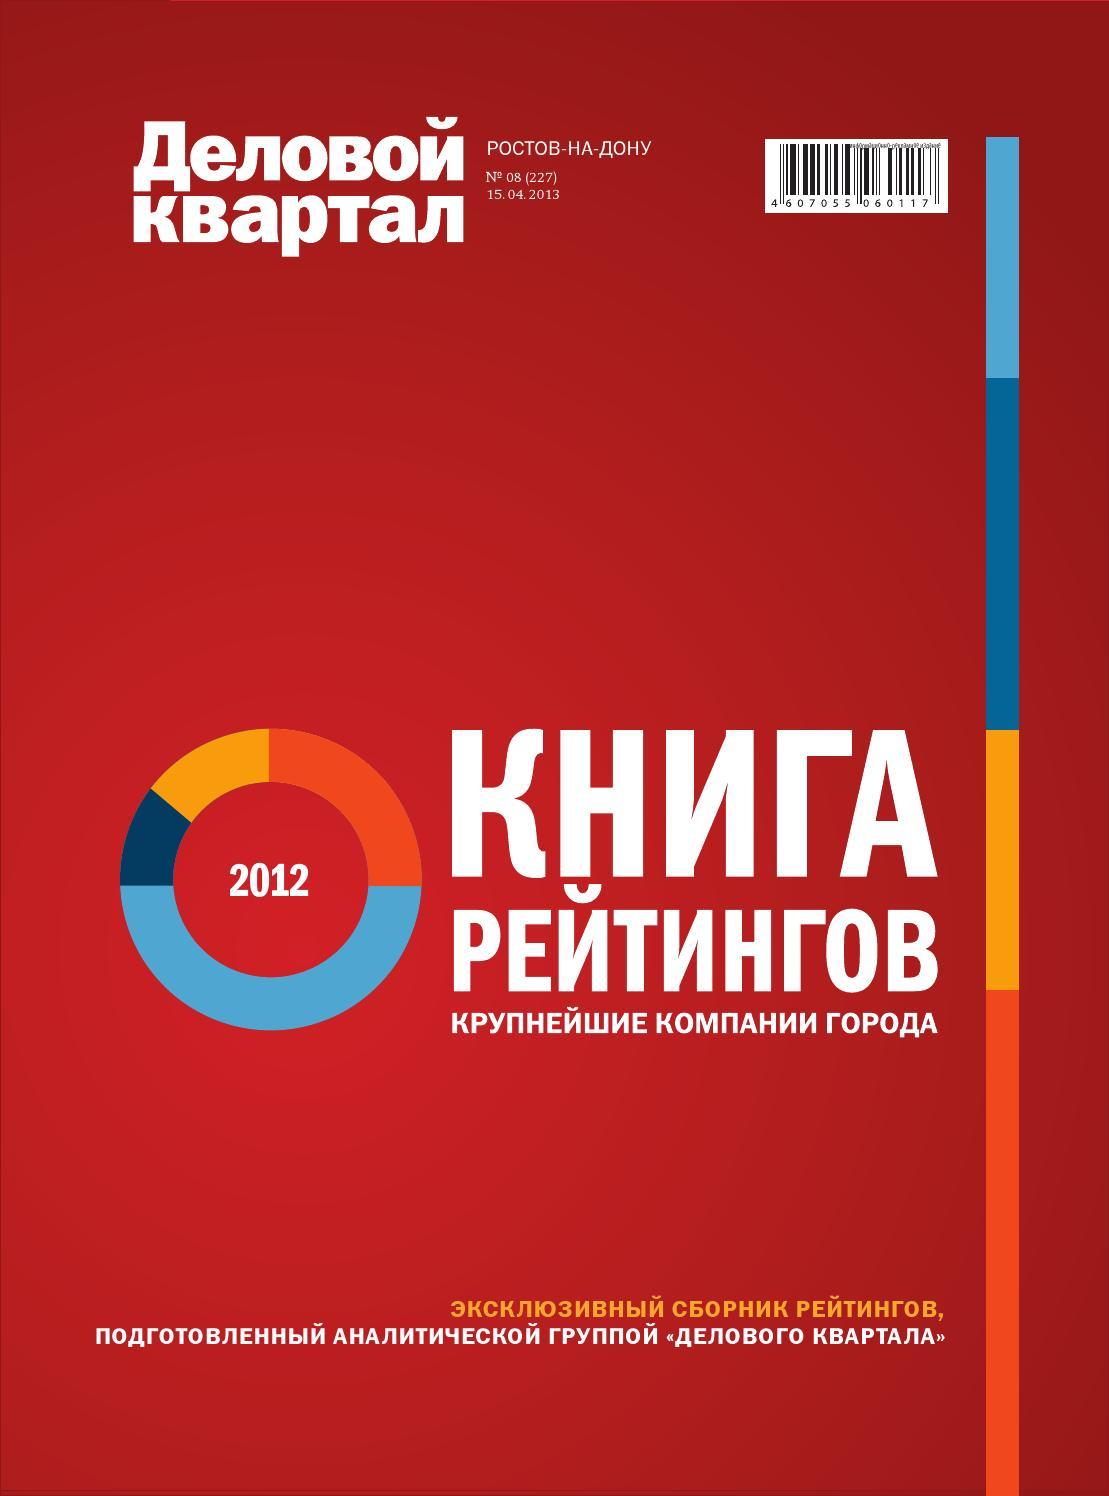 195 рублей за квадратный метр разработка продвижение сайта ооо стам demis ru создание сайтов продвижение сайтов веб дизайн new topic